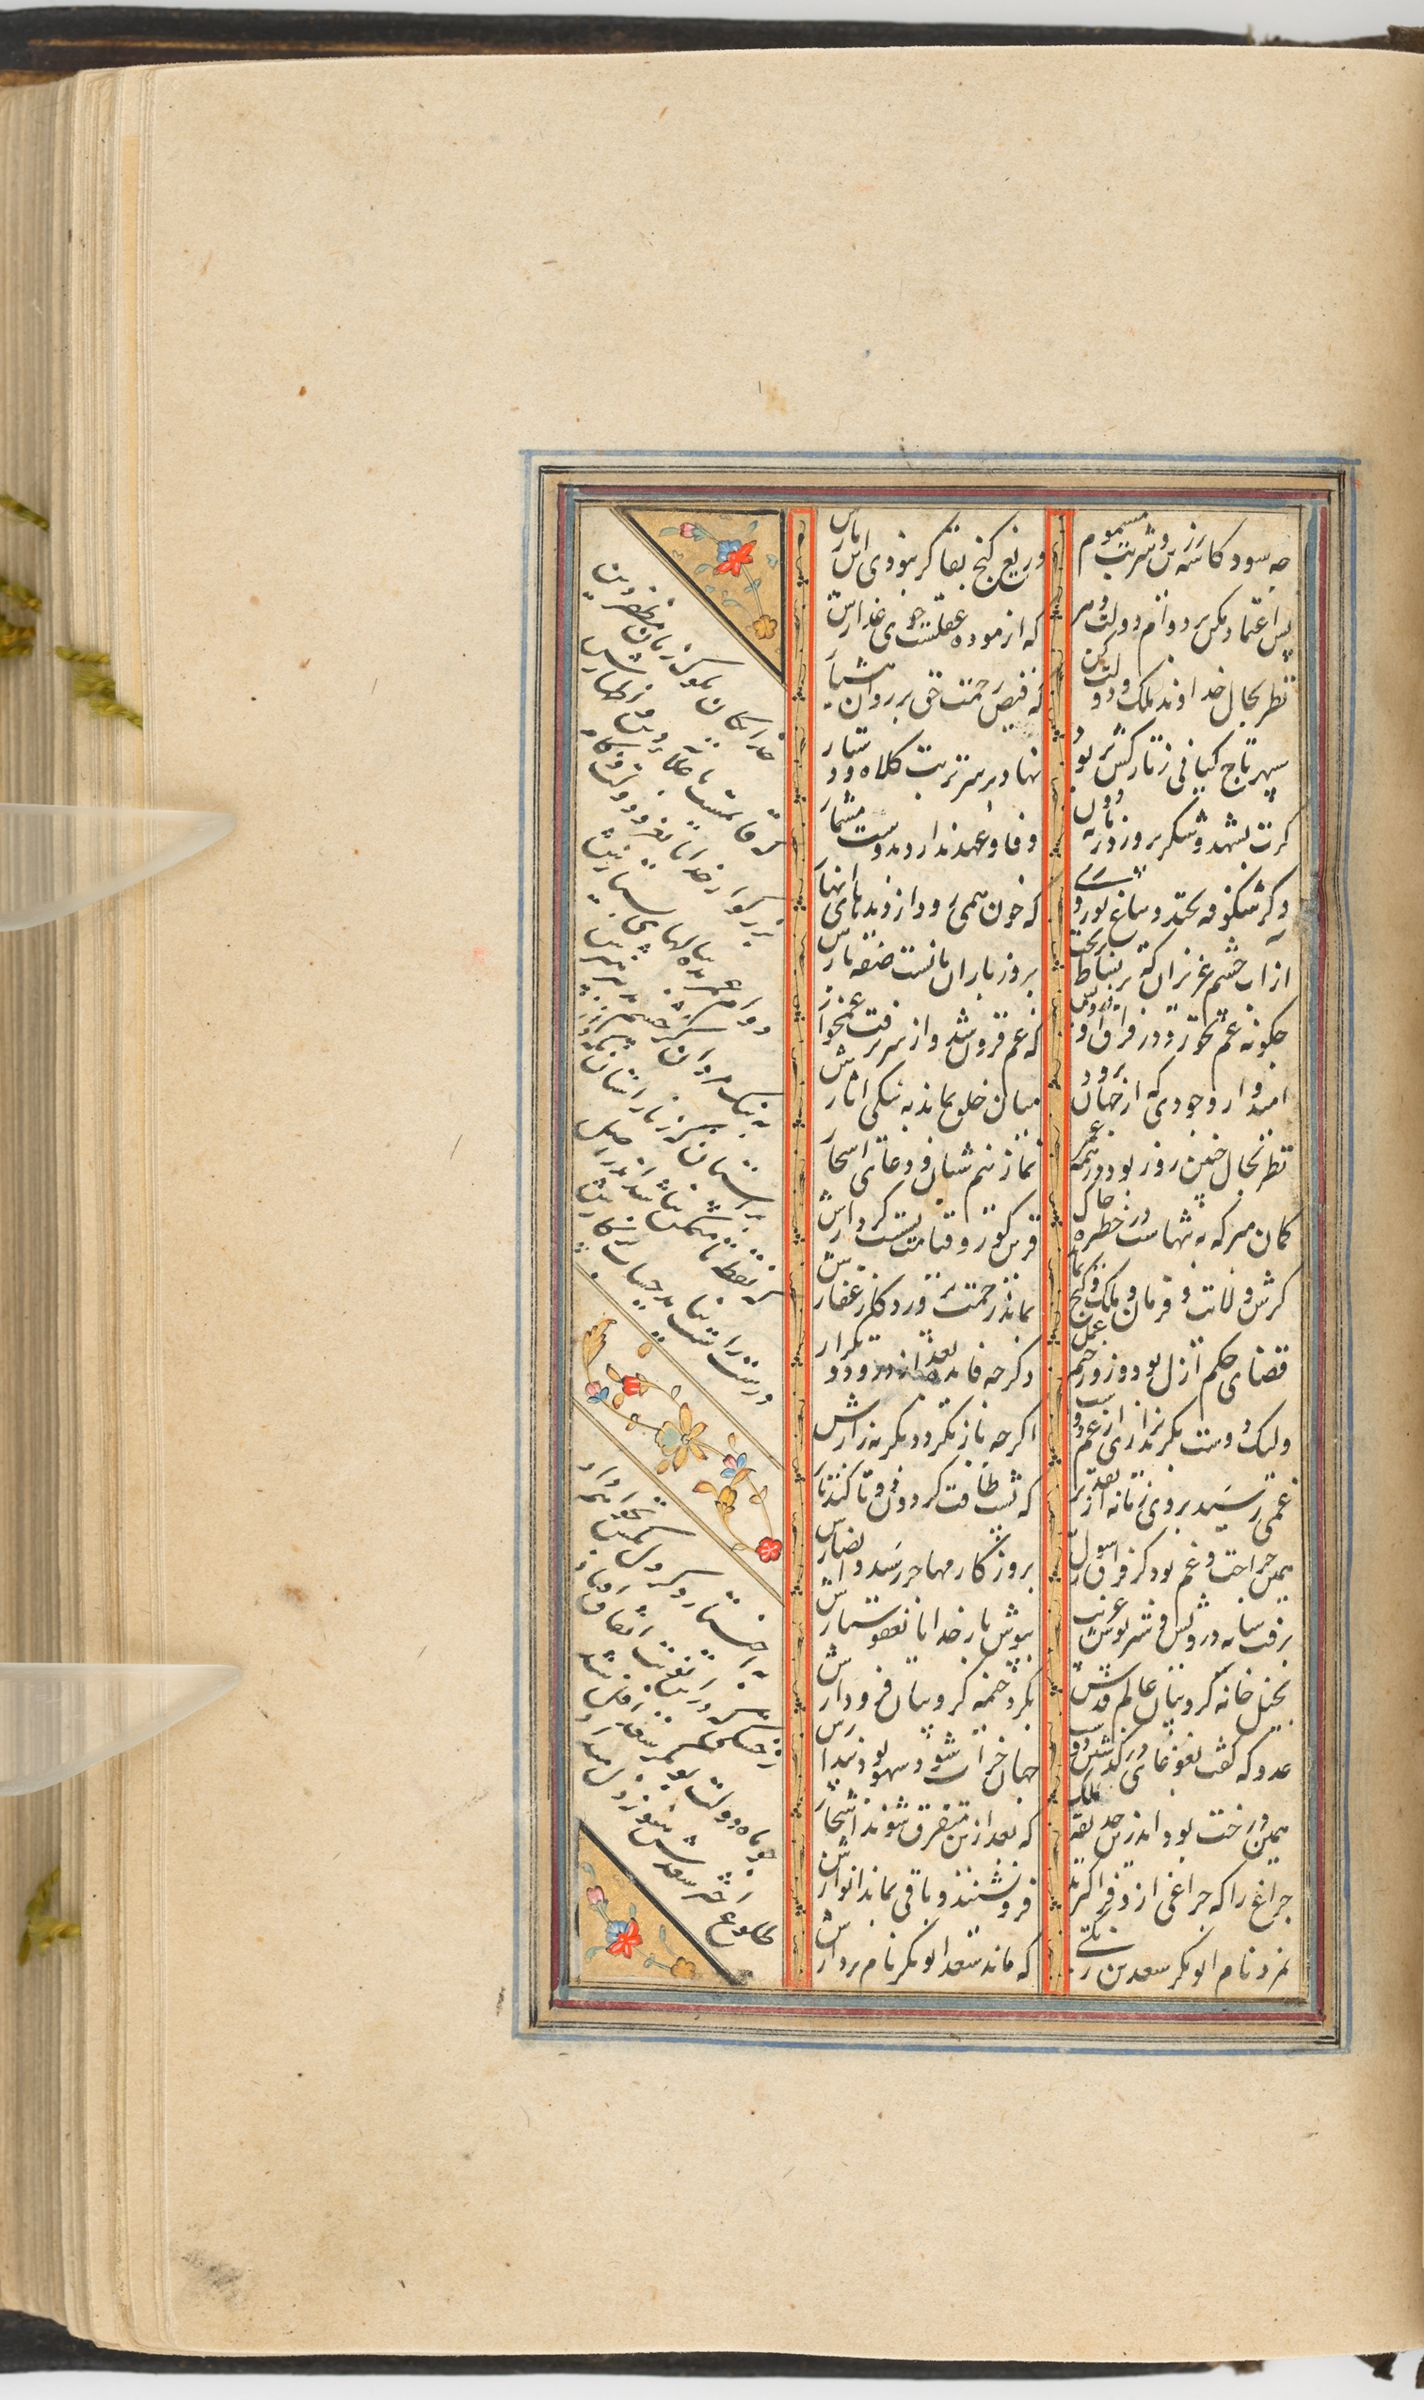 Text Folio (Text Recto; Text Verso Of Folio 179), From A Manuscript Of The Kulliyat Of Sa'di